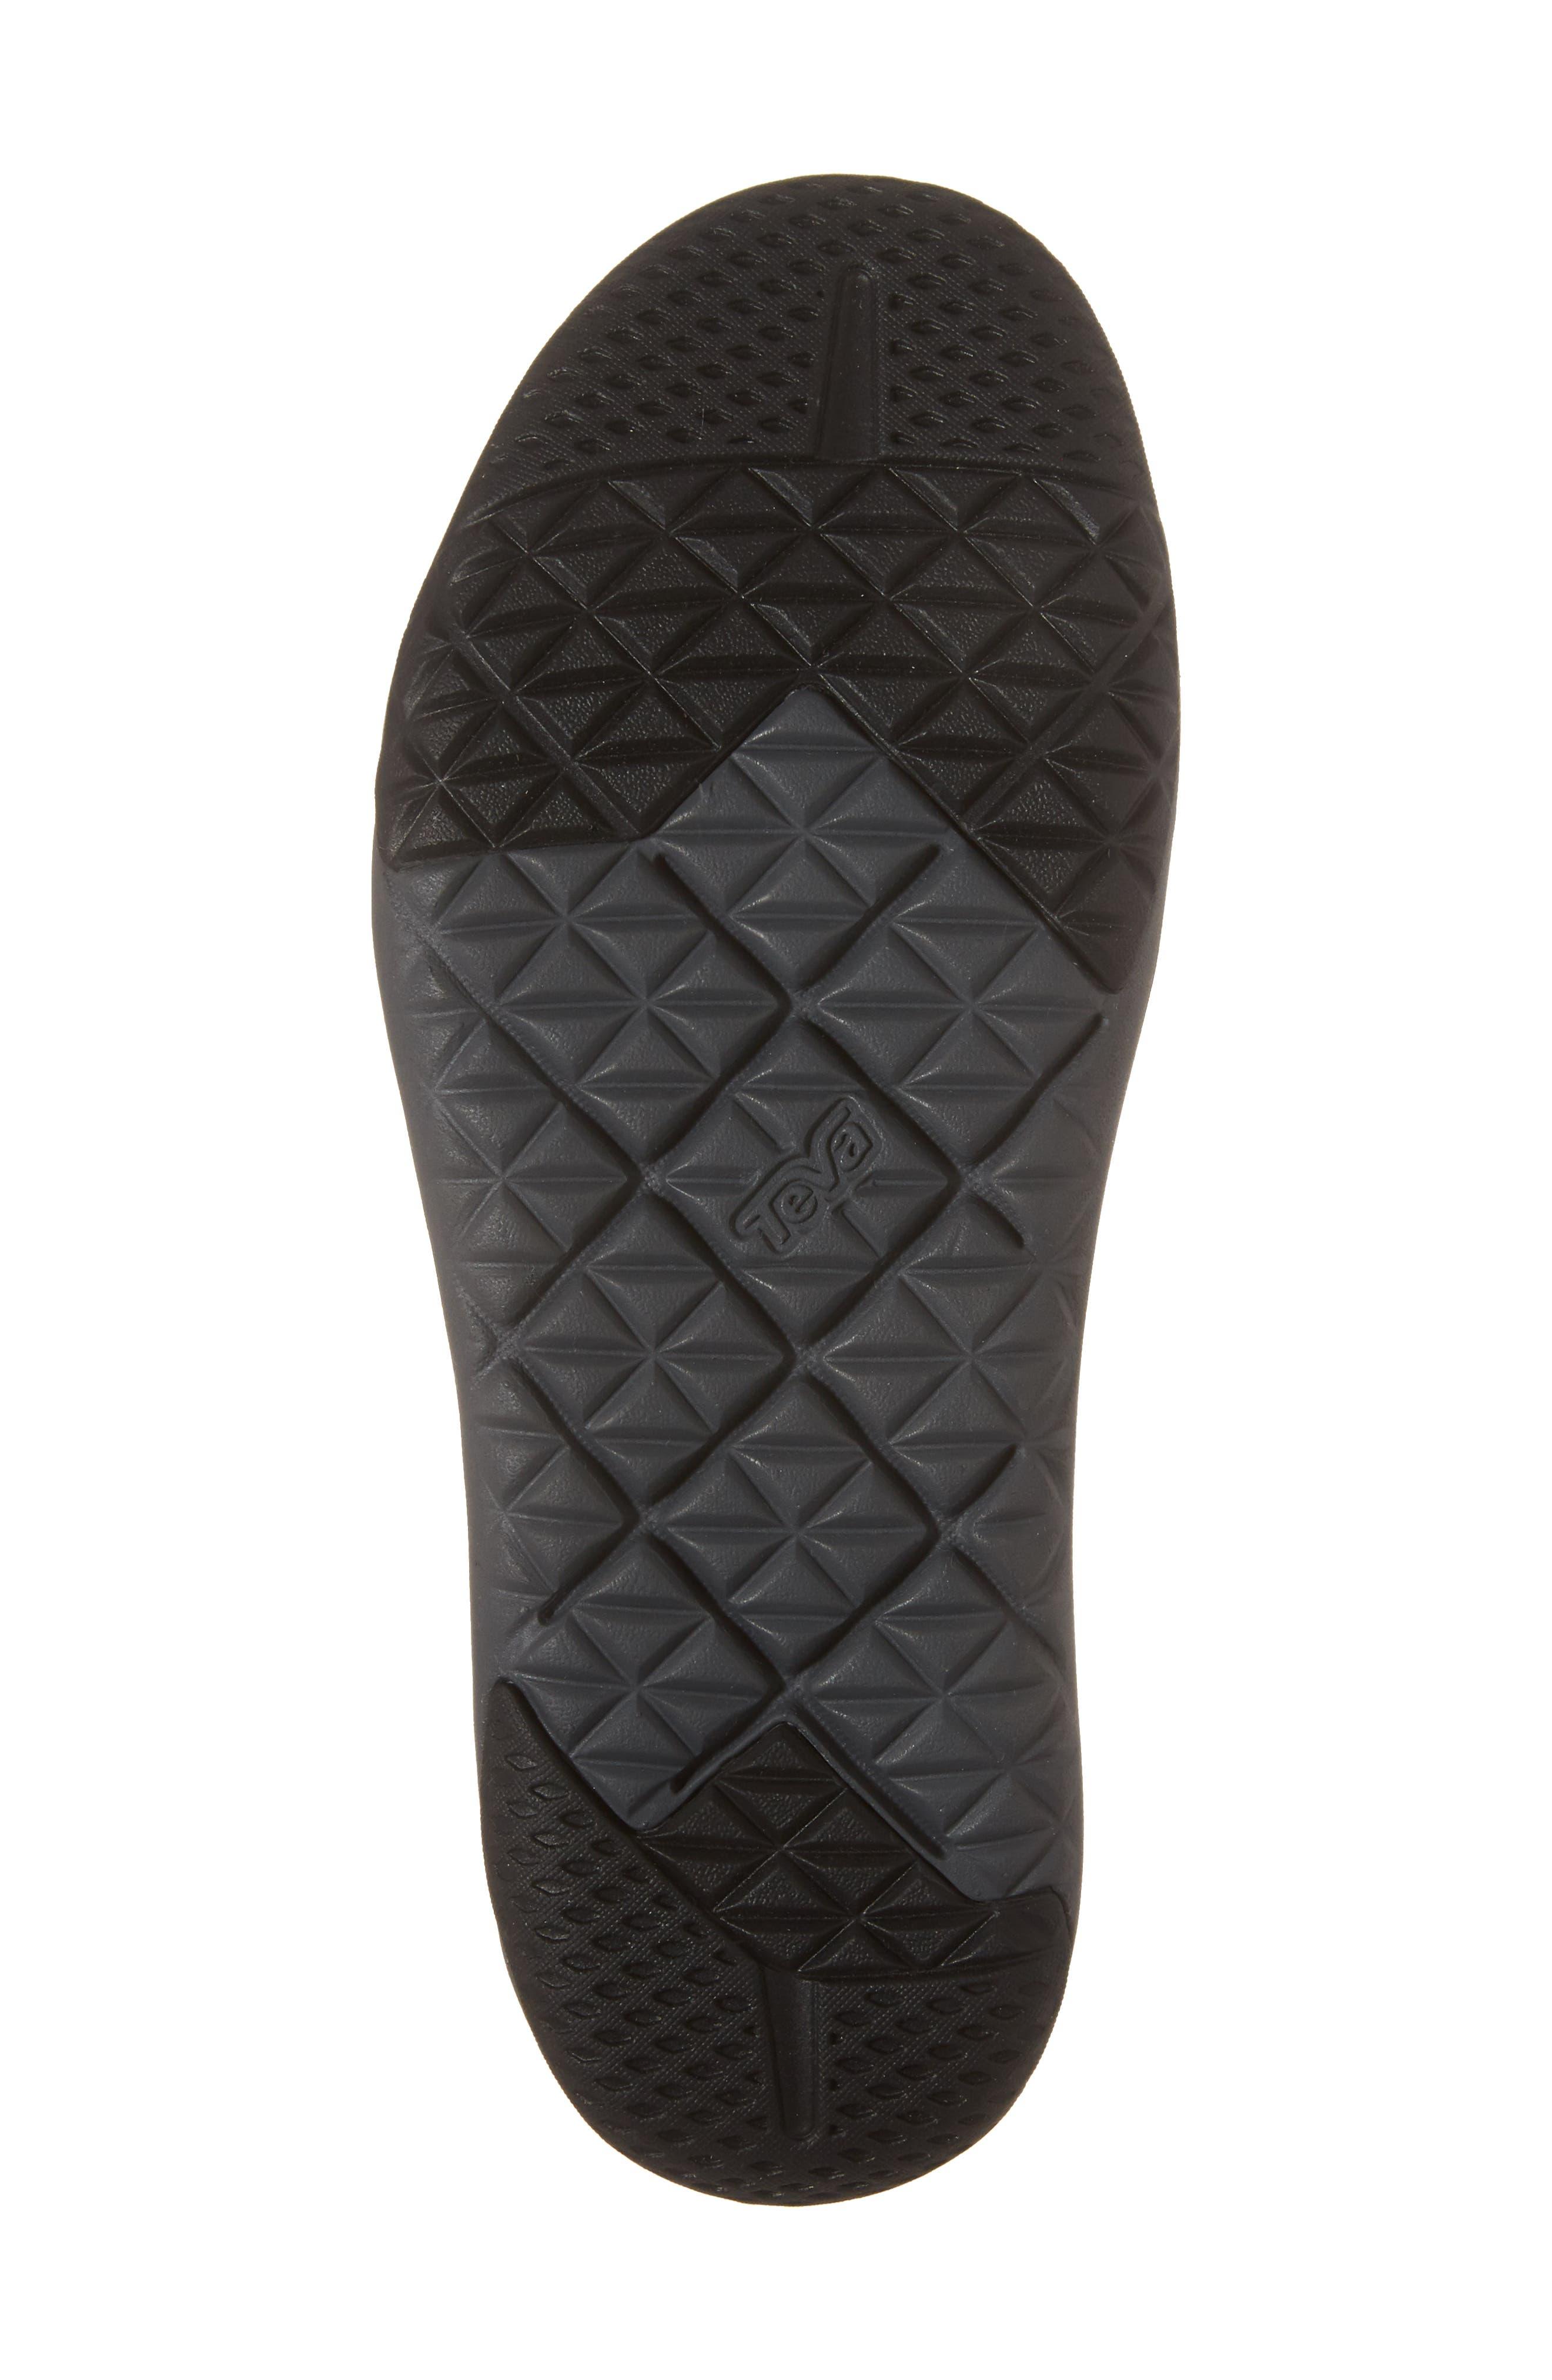 Terra Float Travel Sandal,                             Alternate thumbnail 6, color,                             Black Leather